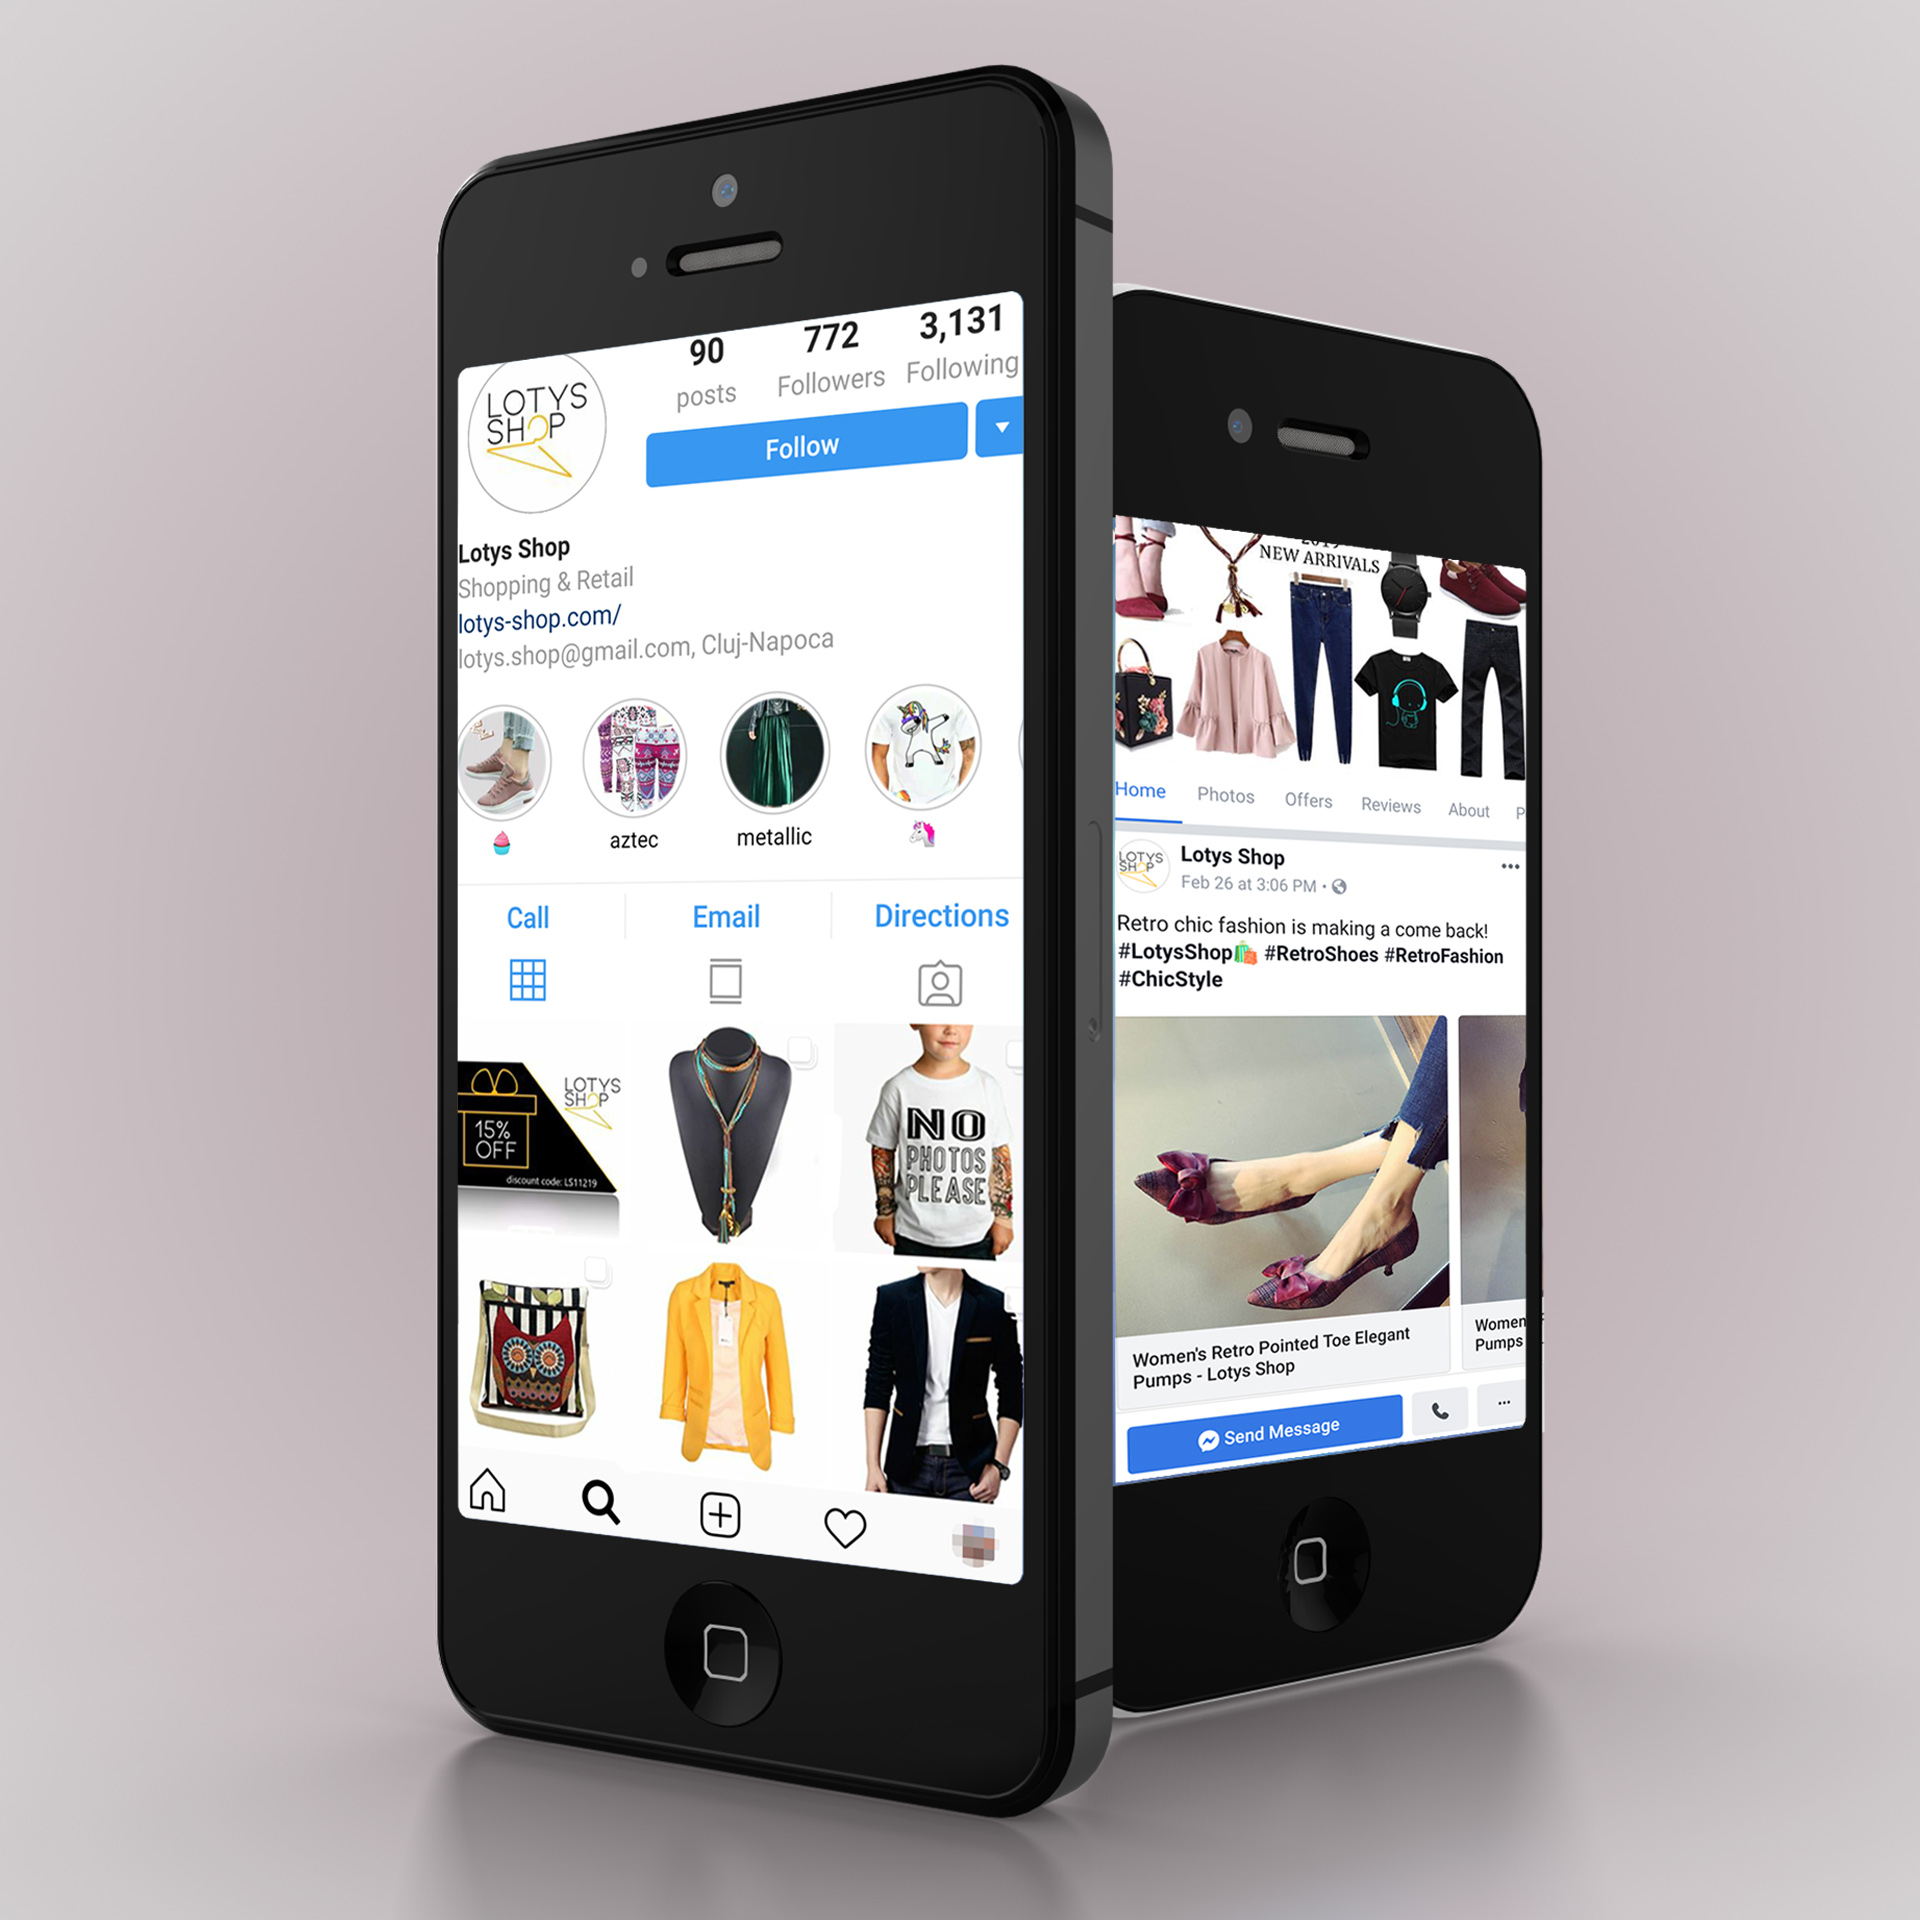 marketing digital Lotys Shop